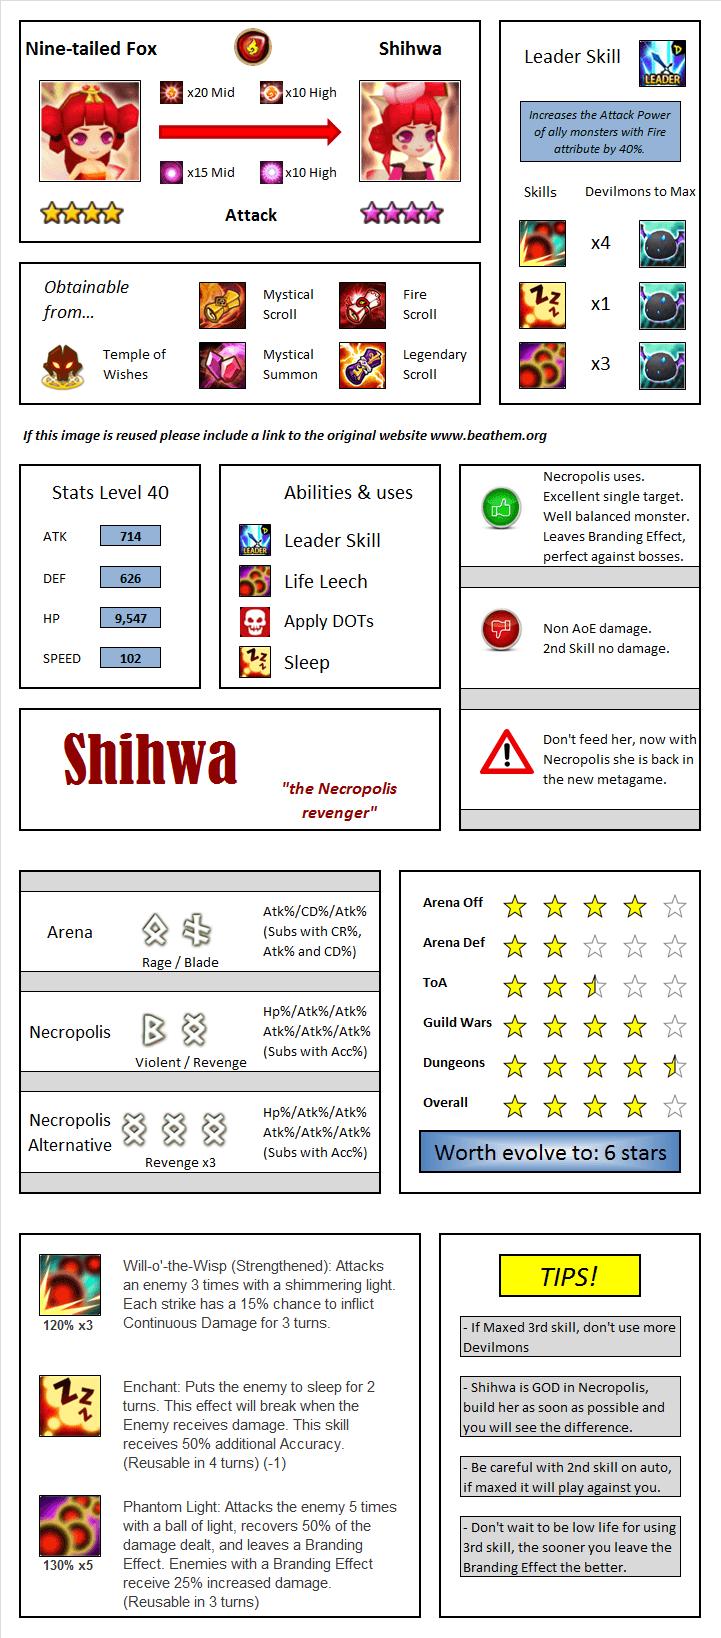 Shihwa Nine-tailed Fox Infographic